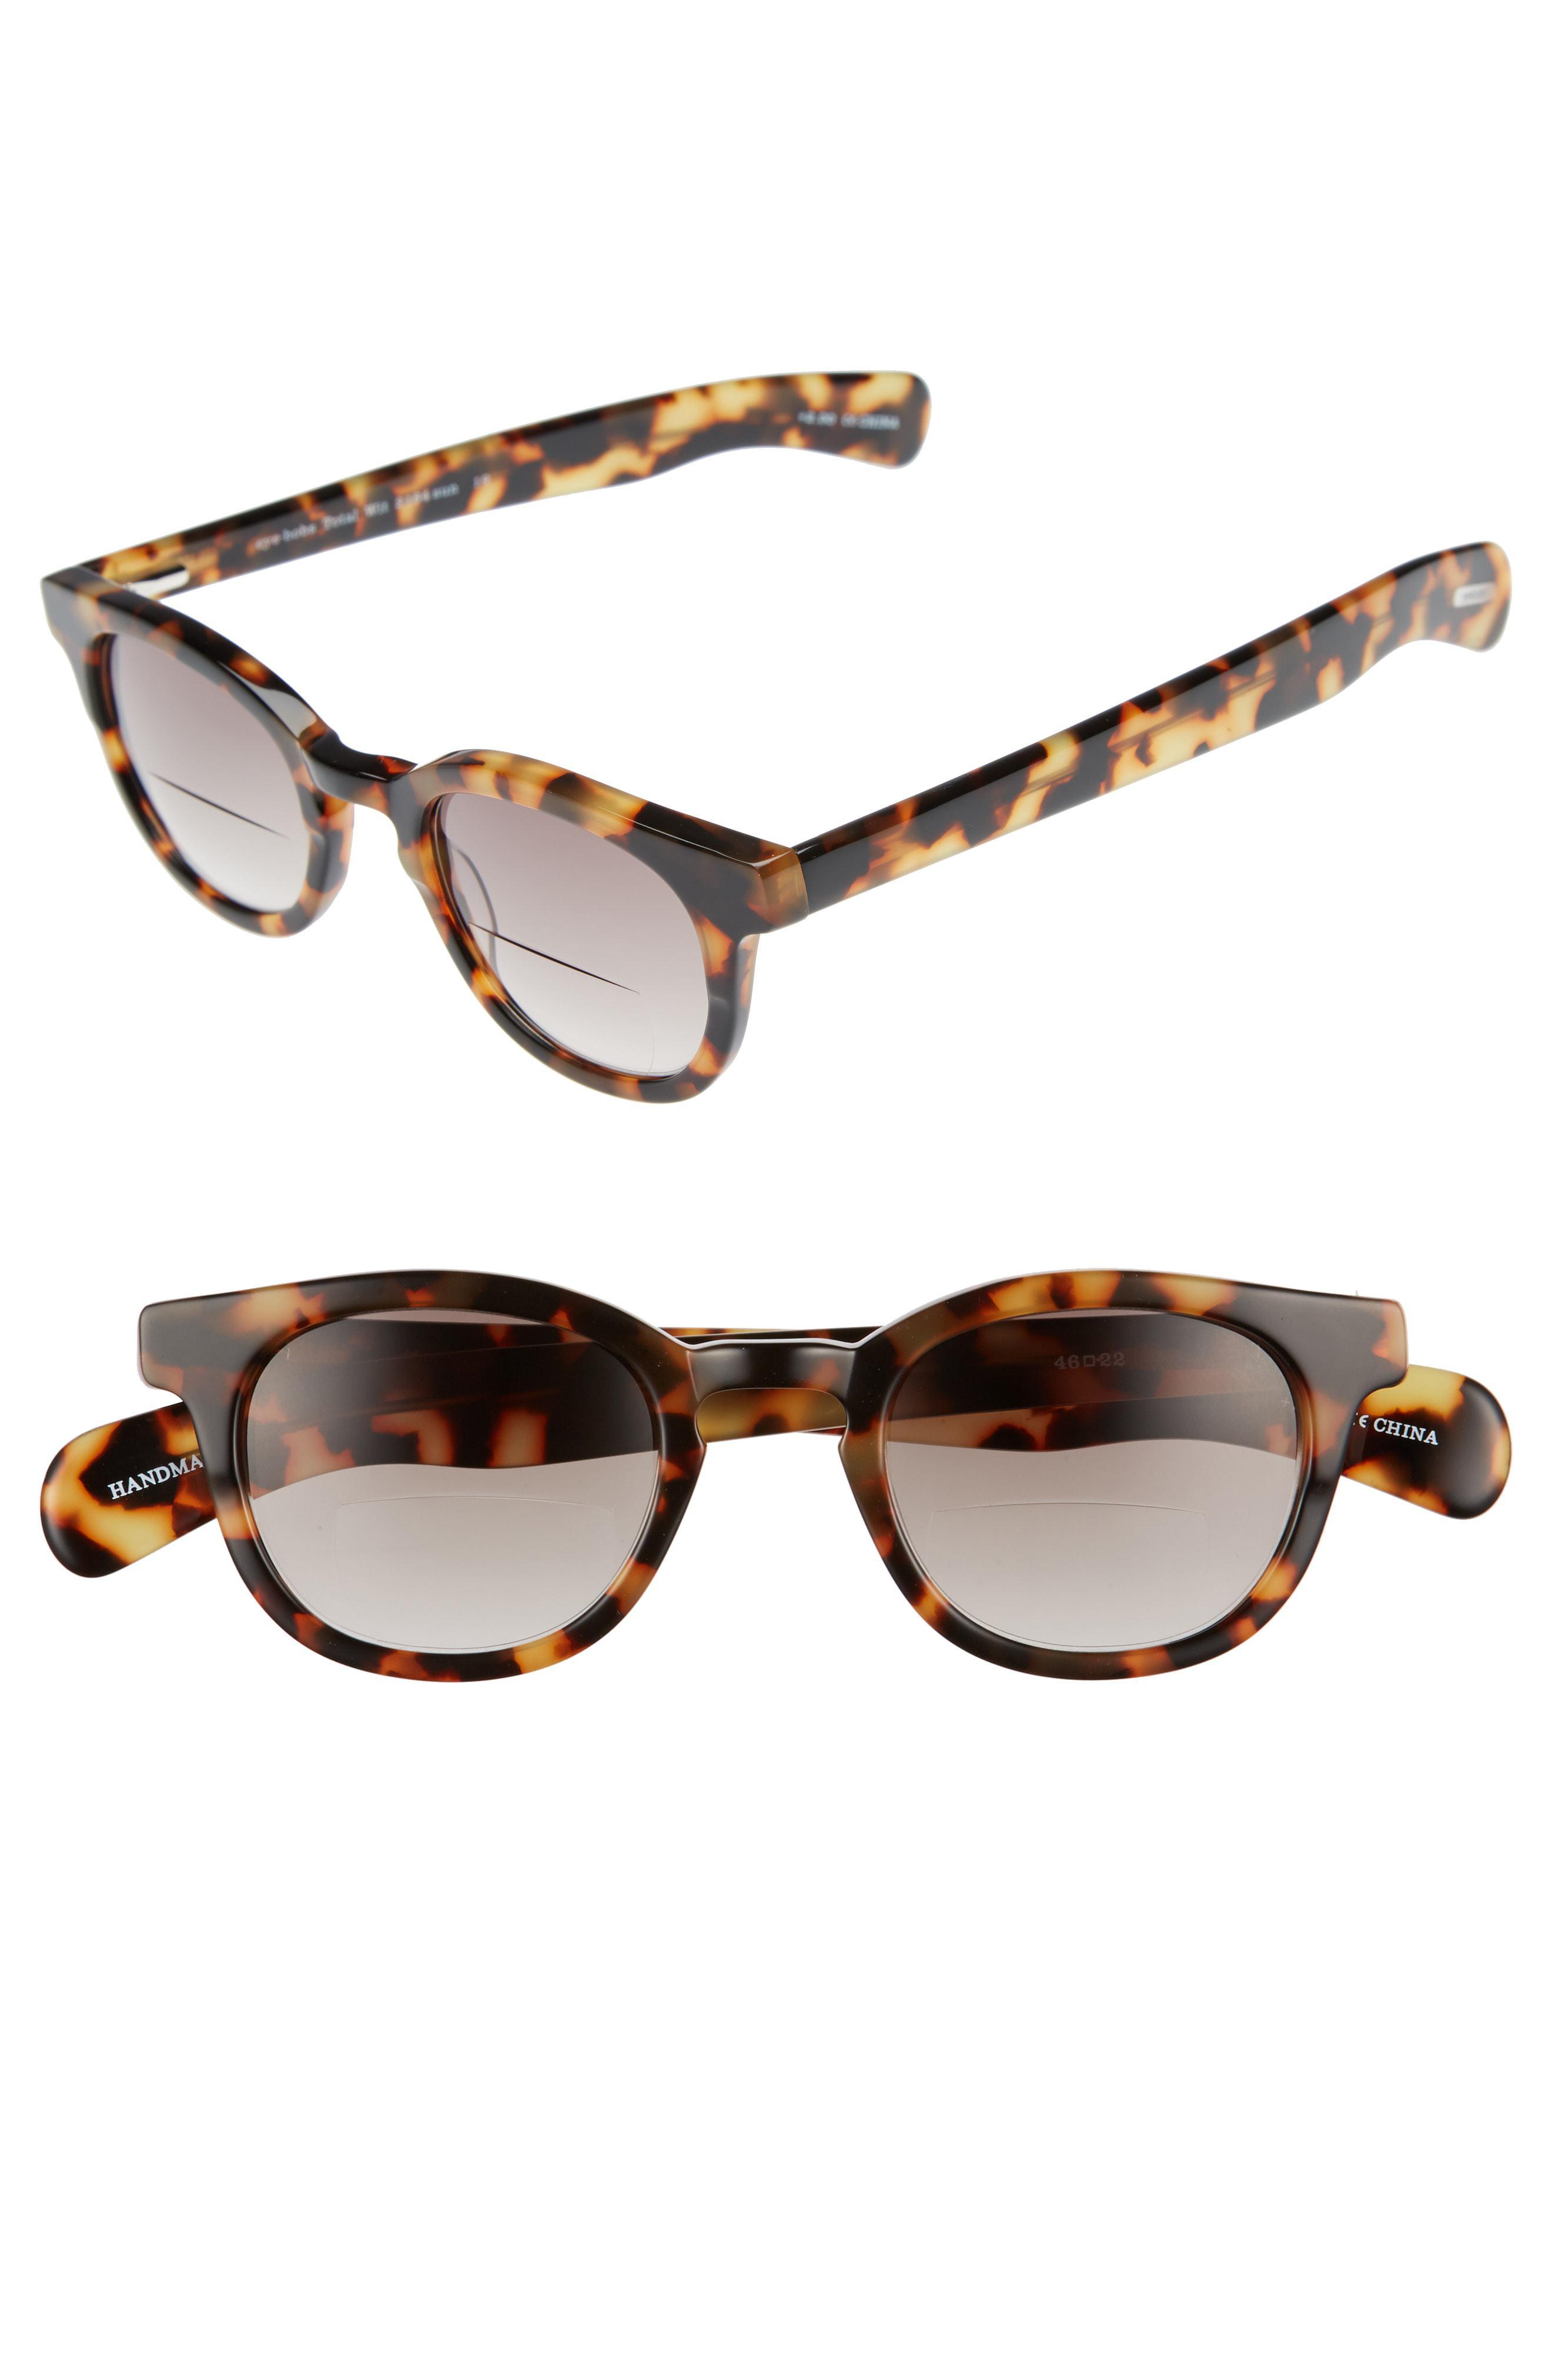 5b9e5de2b7 Lyst - Eyebobs Total Wit 46mm Sunreader Reading Glasses - in Brown ...